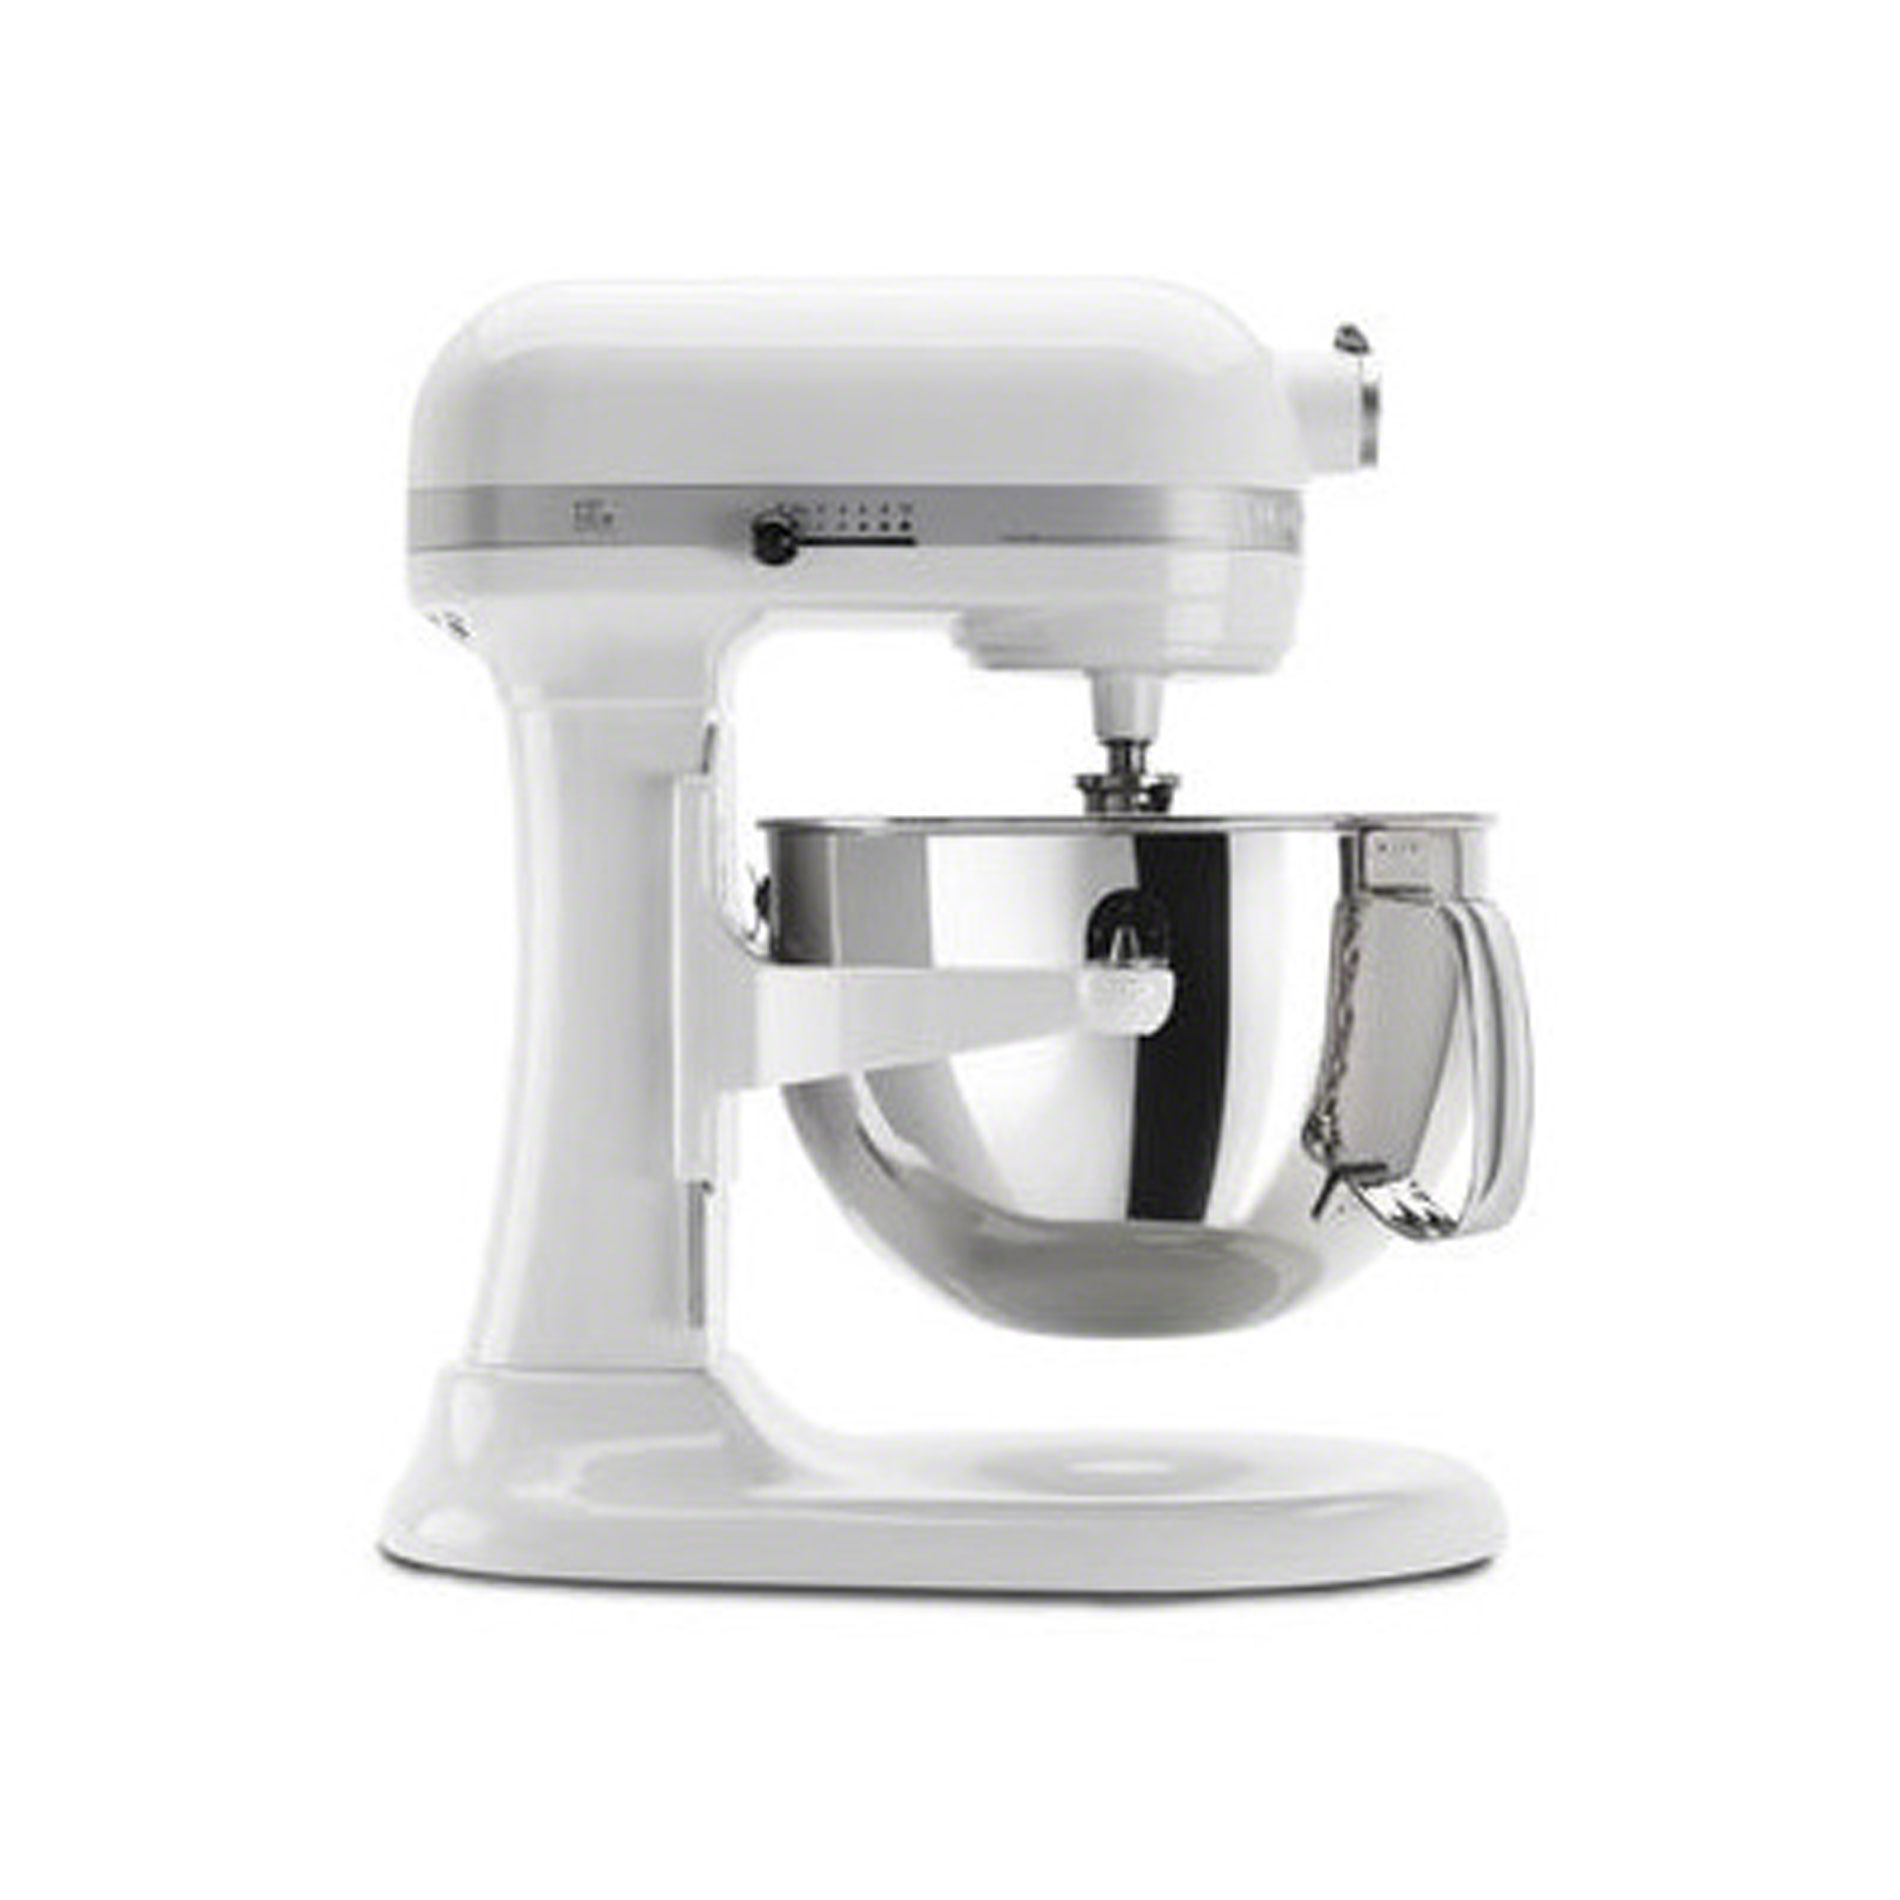 Kitchenaid Mixer Professional 6 Photo 4 Kitchen Ideas